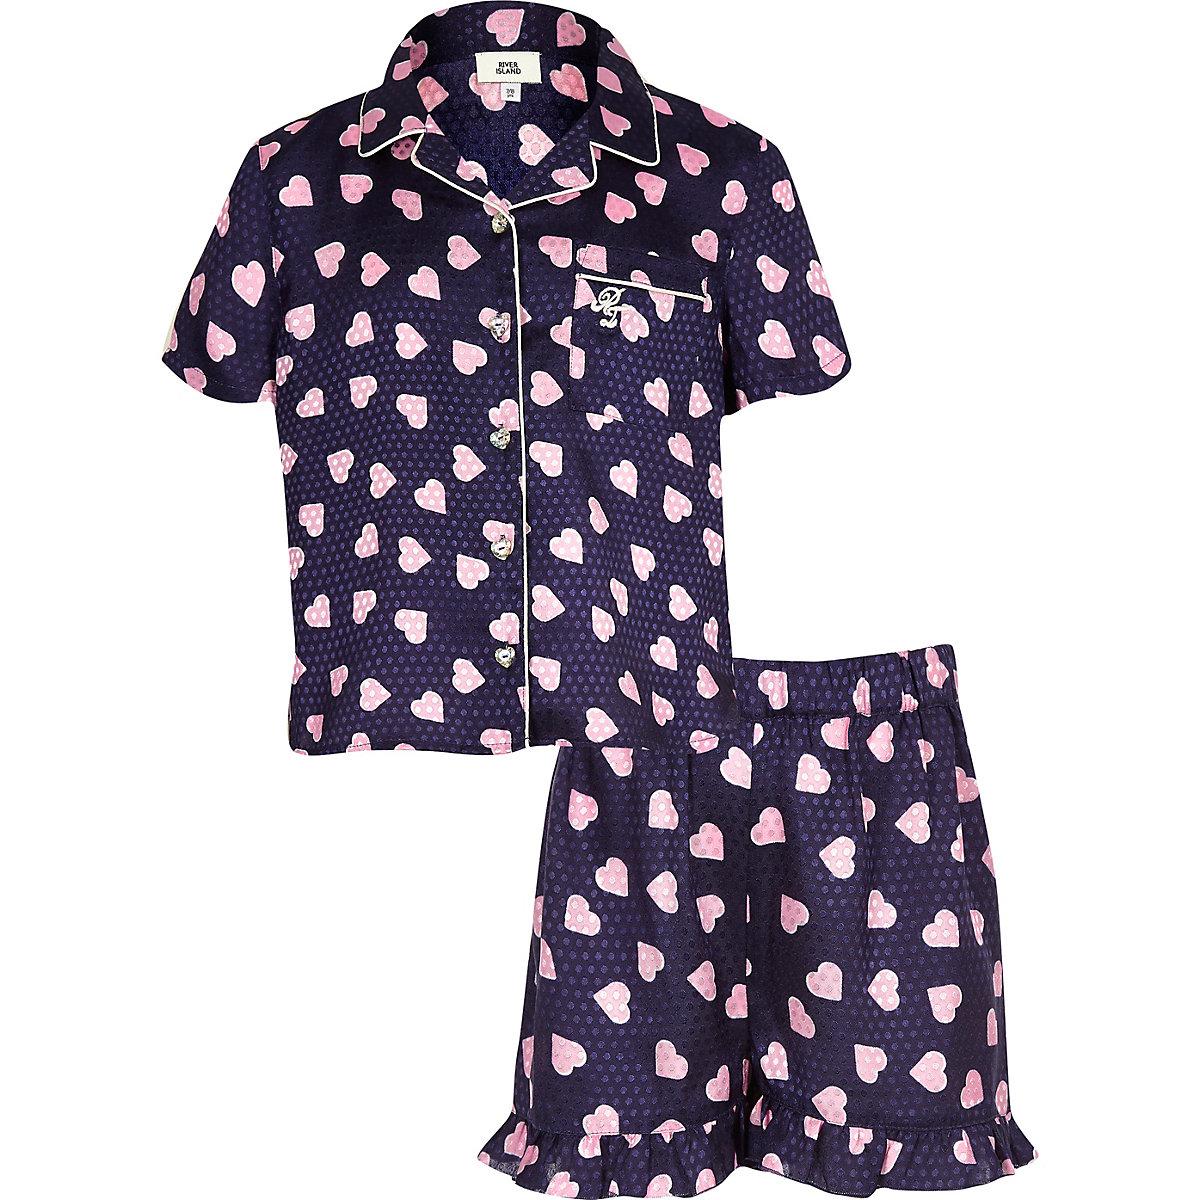 Girls navy heart print pyjama set